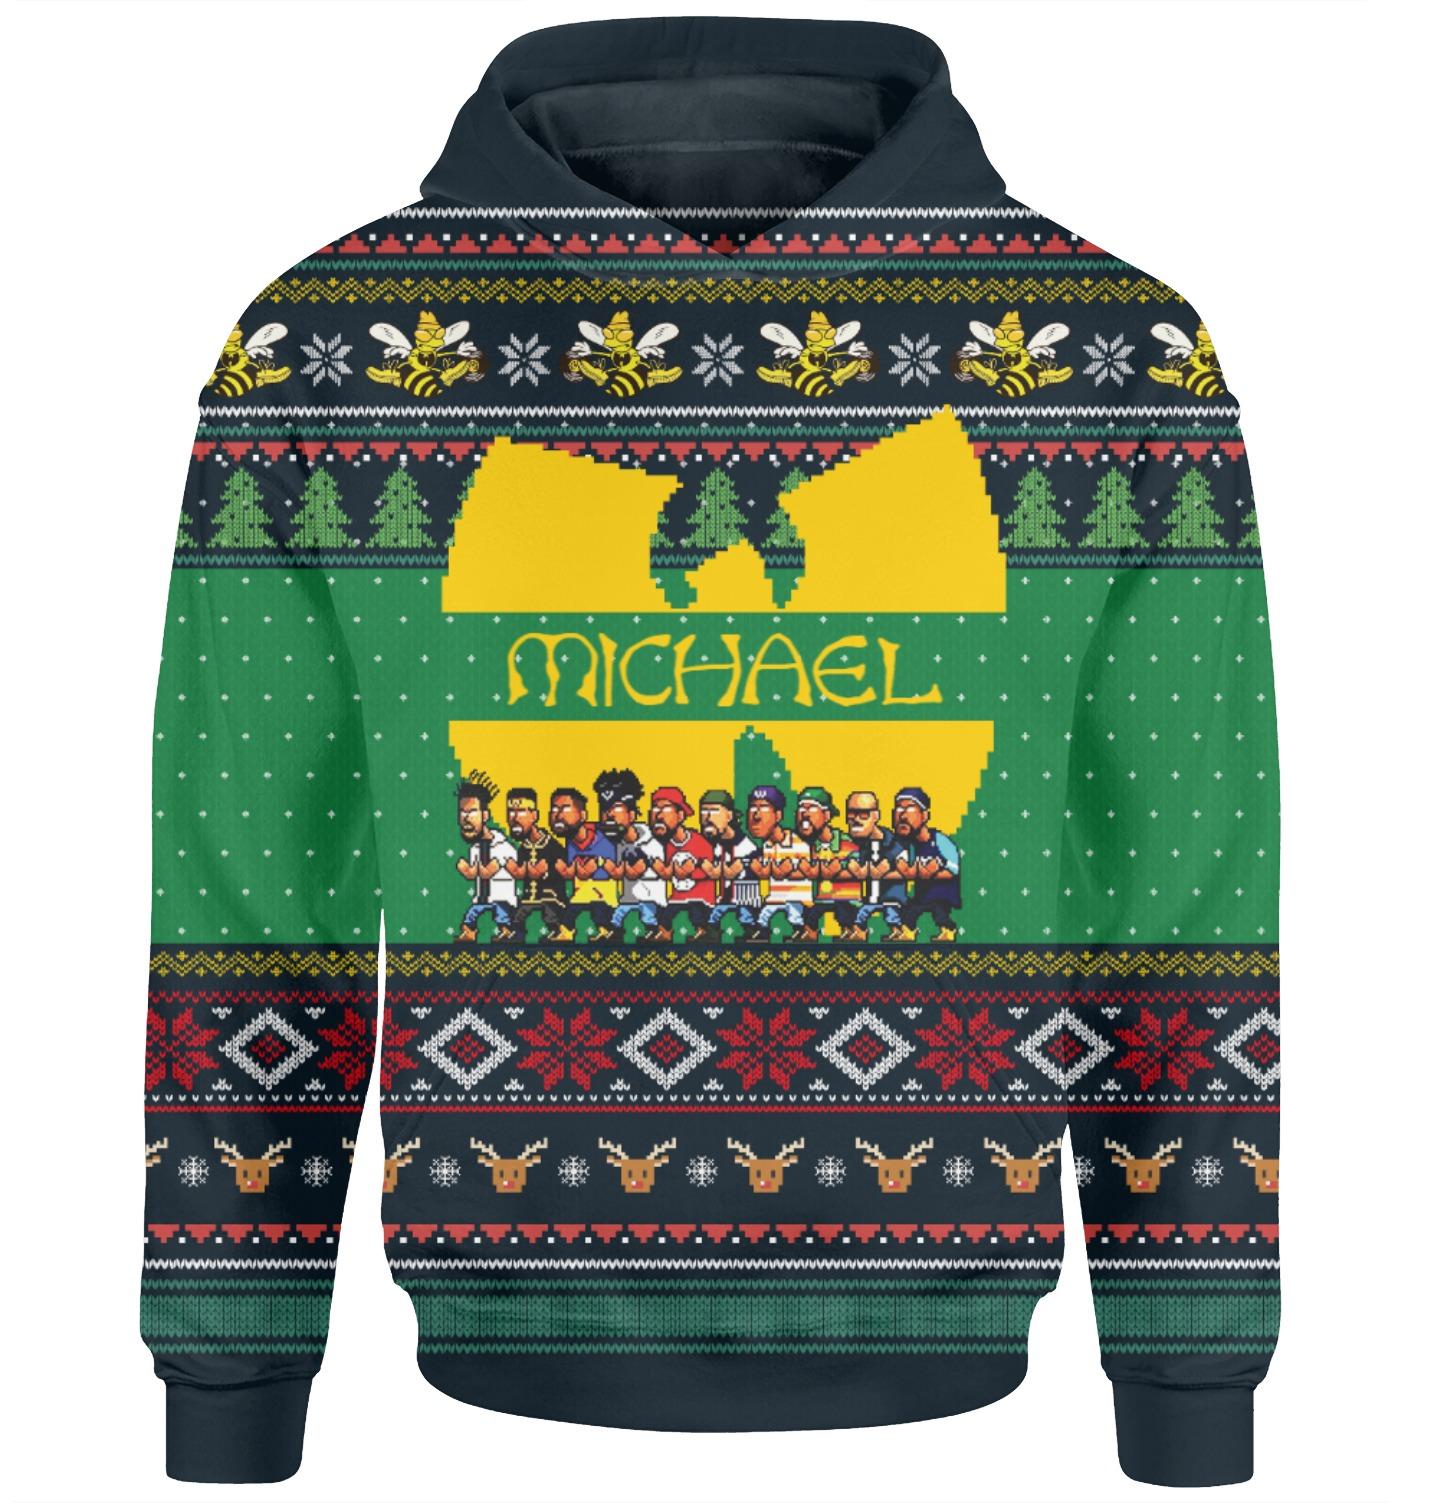 Wu tang clan custom personalized name 3d hoodie